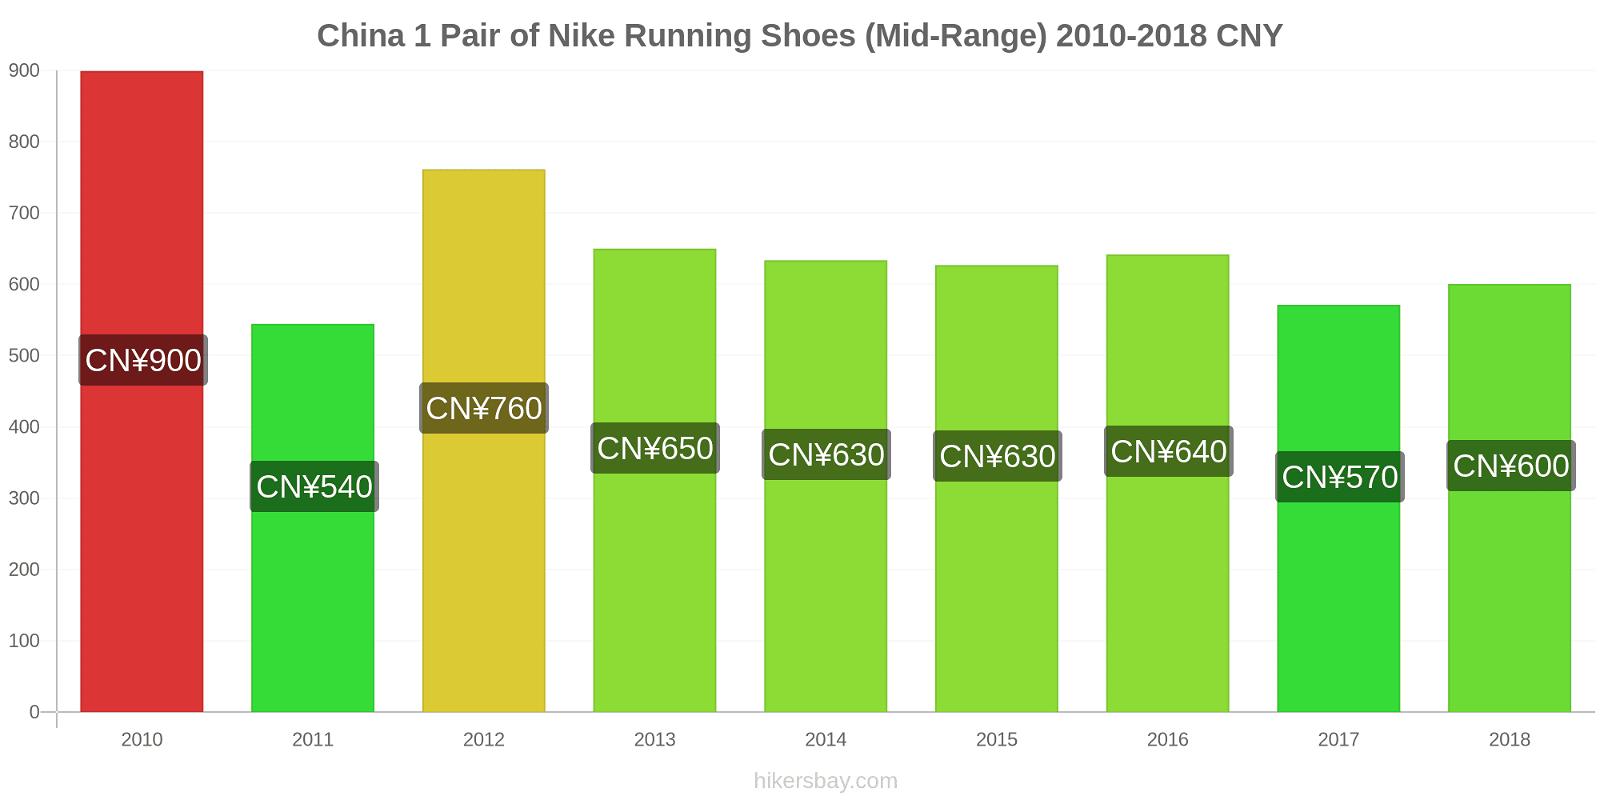 China price changes 1 Pair of Nike Running Shoes (Mid-Range) hikersbay.com